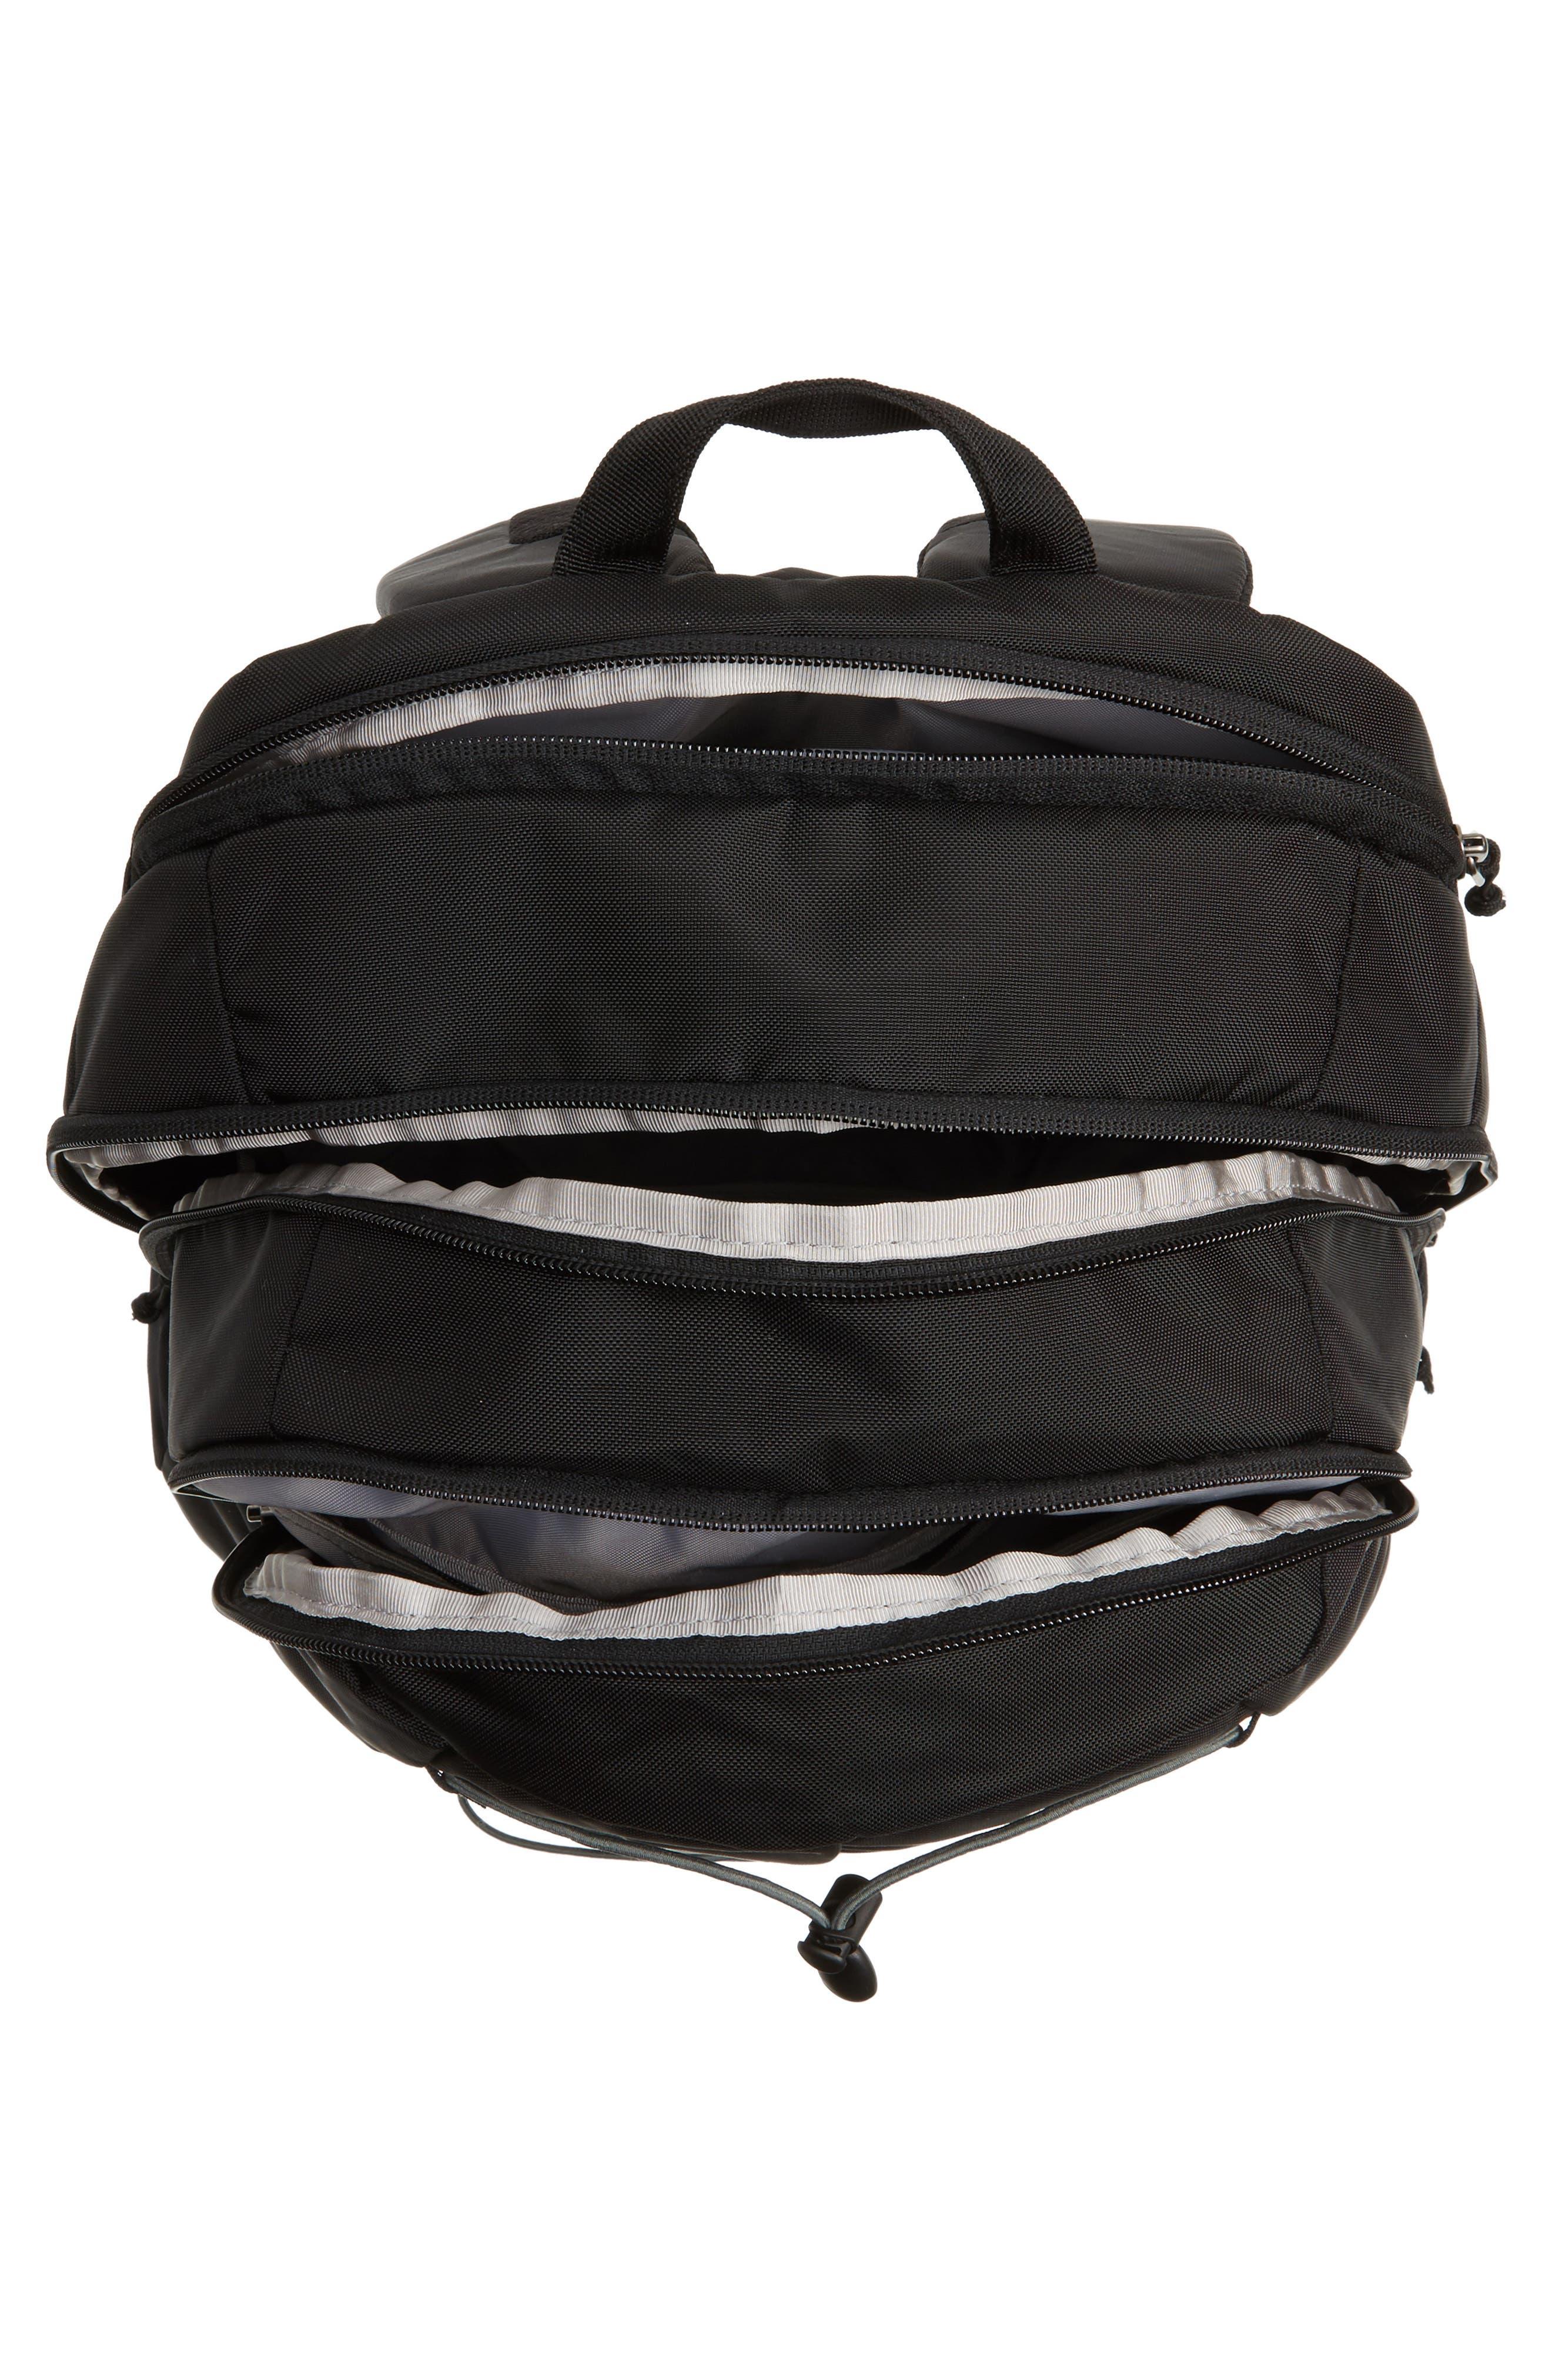 30L Chacabuco Backpack,                             Alternate thumbnail 4, color,                             BLACK